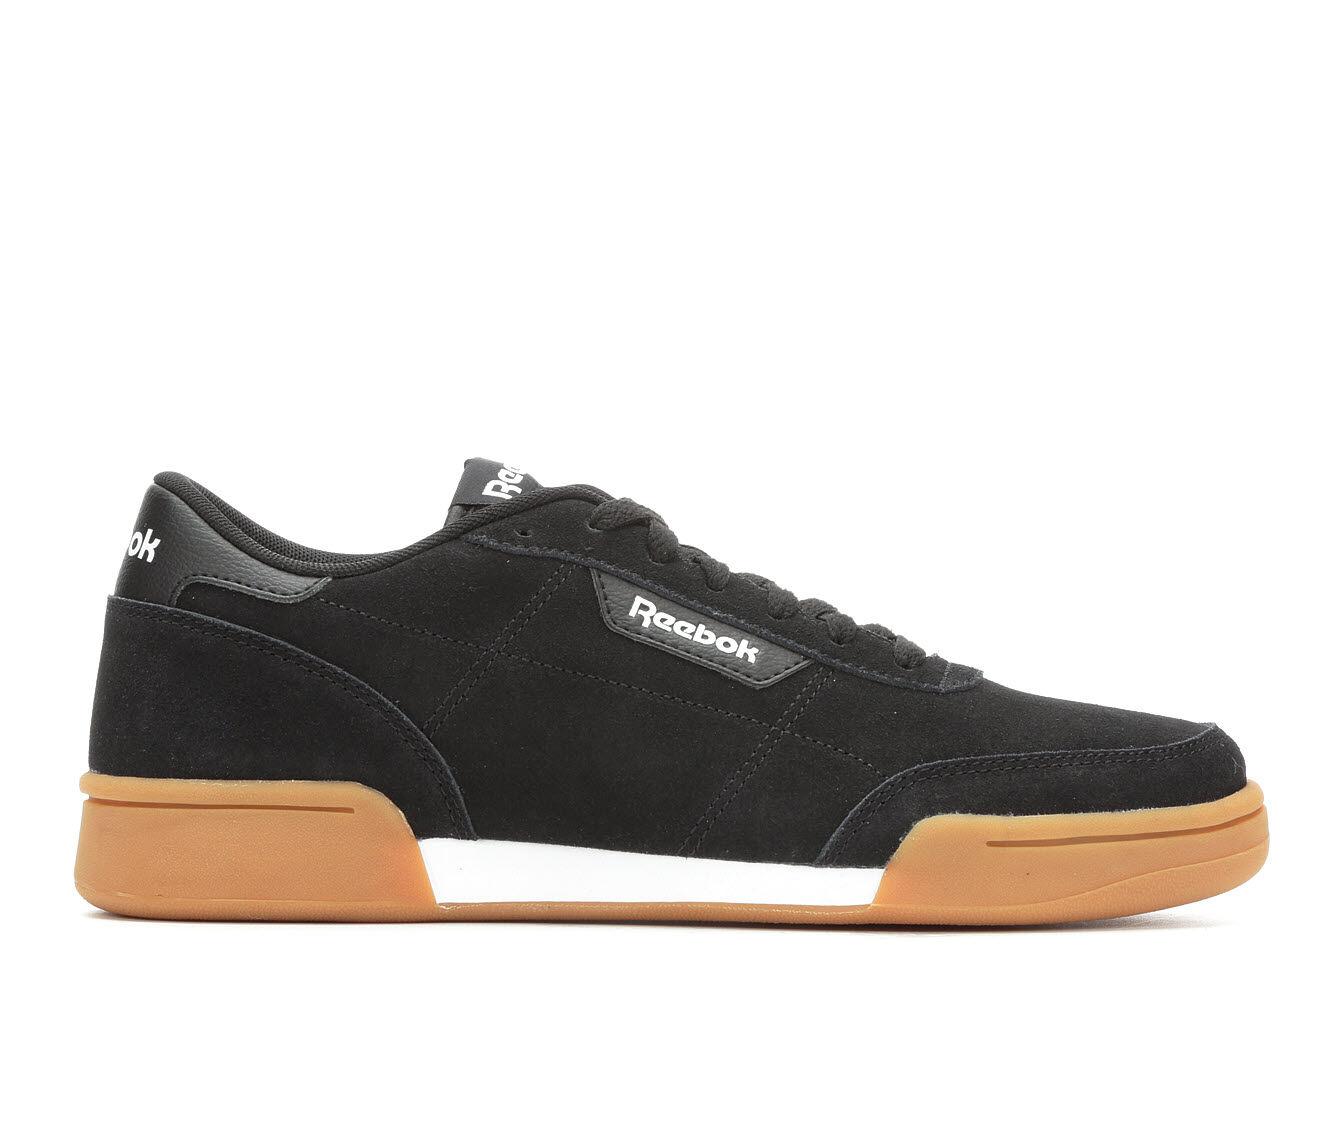 Men's Reebok Royal Heredis Tennis Shoes Blk/Wht/Gum